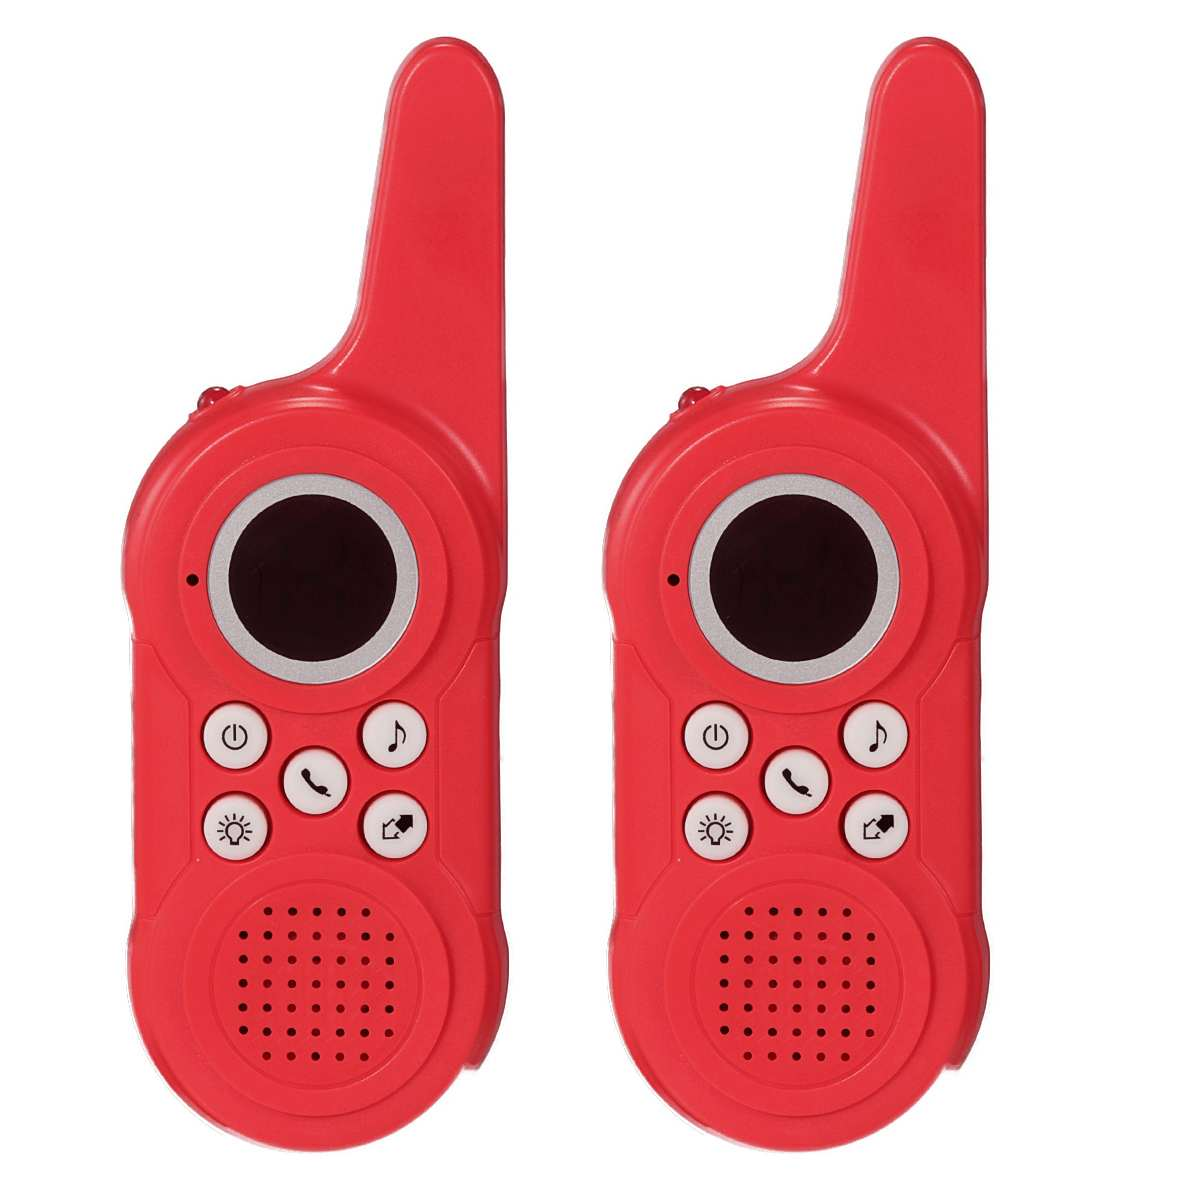 2 Pcs Set Children Game Toys Walkie Talkies Two Way Radio Long Range Handheld Wireless Transceiver Machine Kids Children's Gift